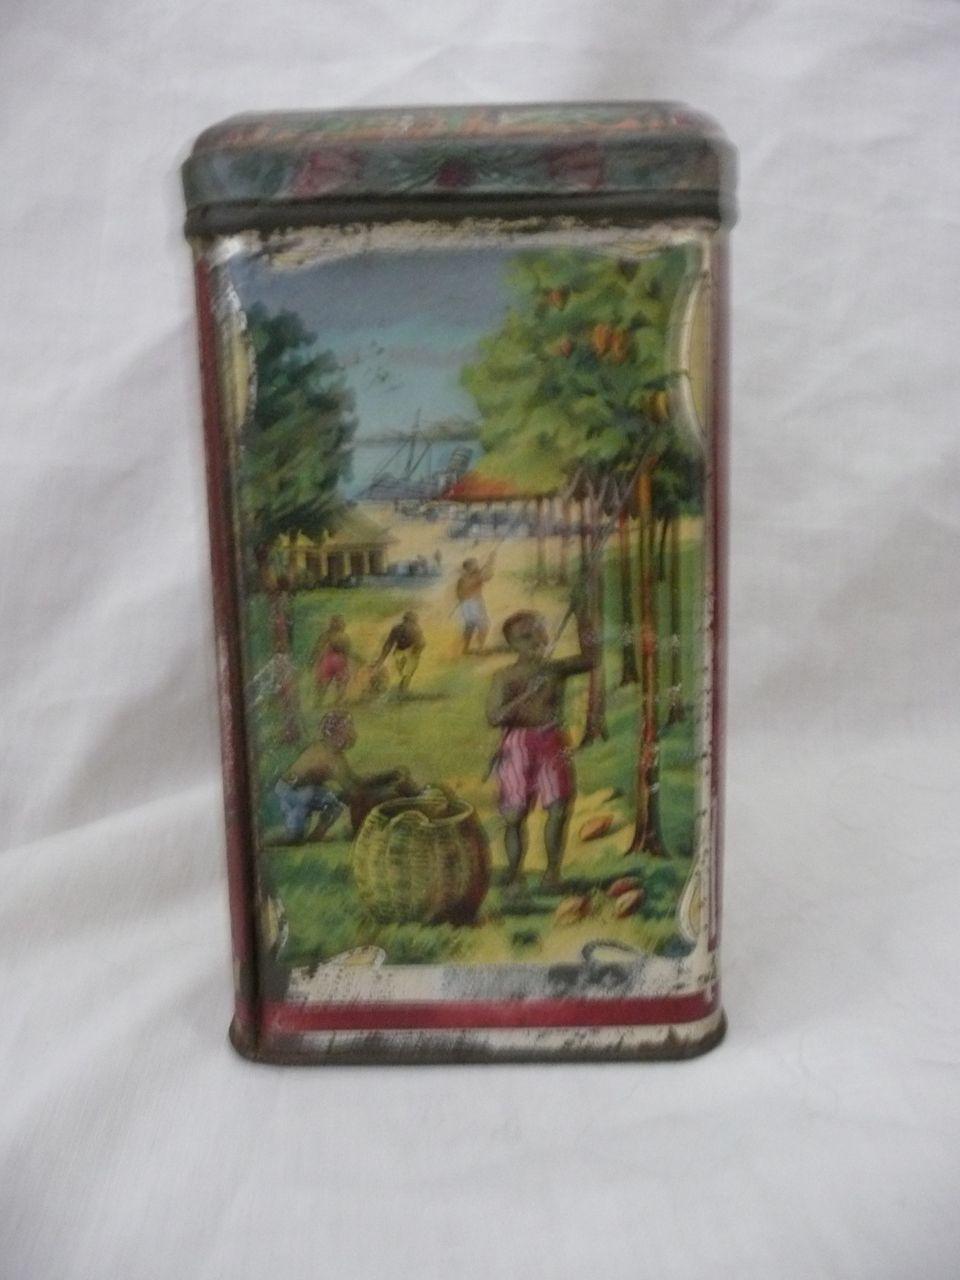 COOLIE Brand Cocoa Tin - Indian Tea Planters Combination - London - Circa 1890-1910